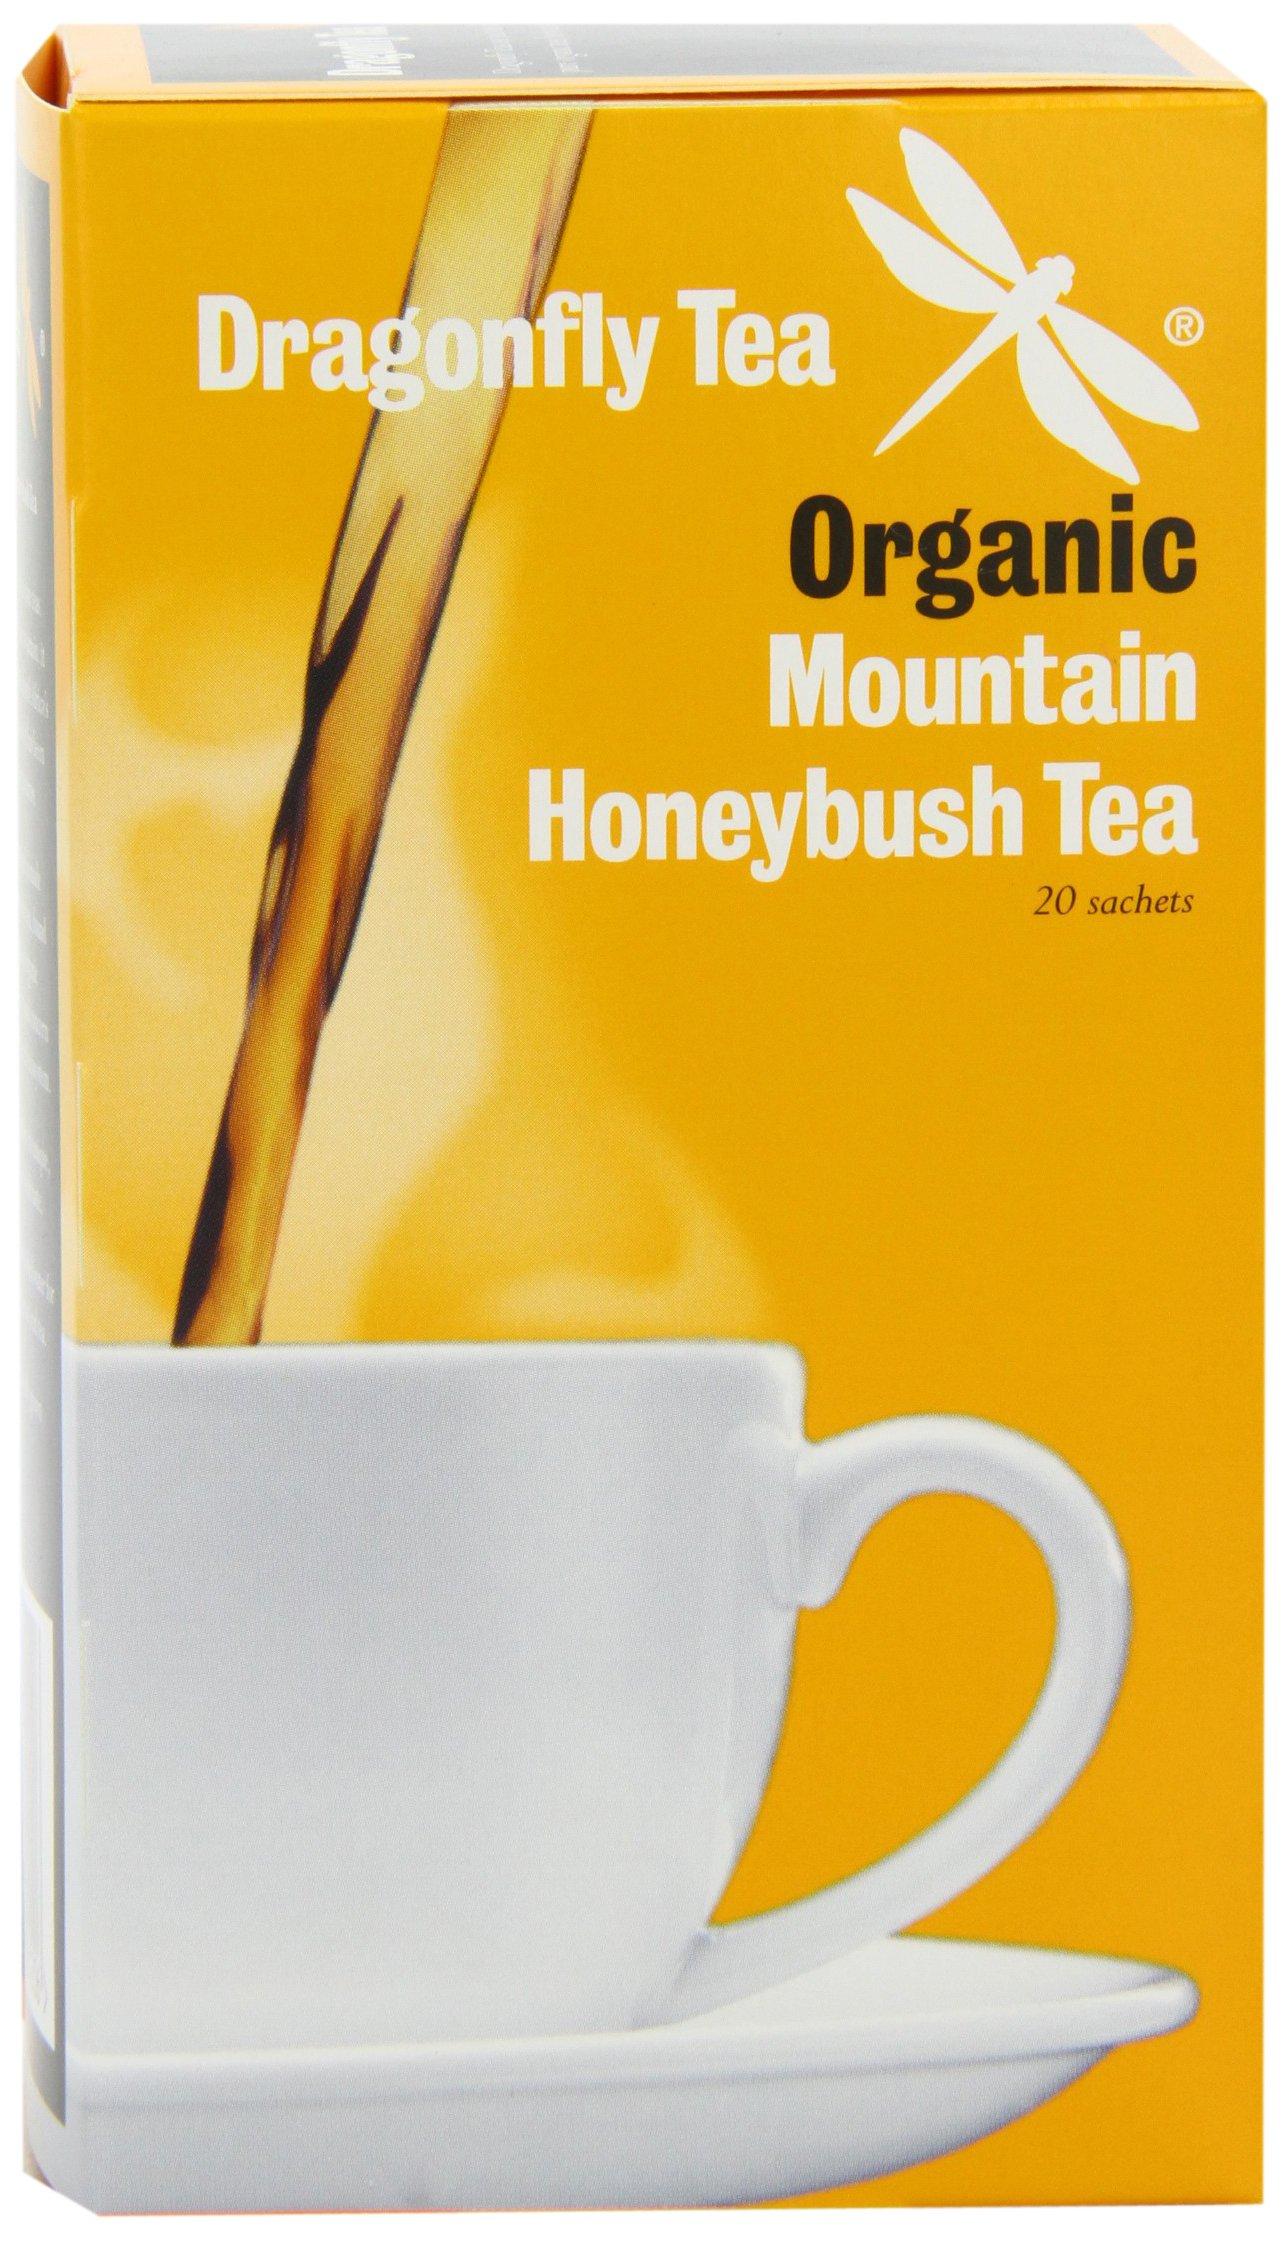 Libelle-Libelle-organischen-Honeybush-20-Beutel